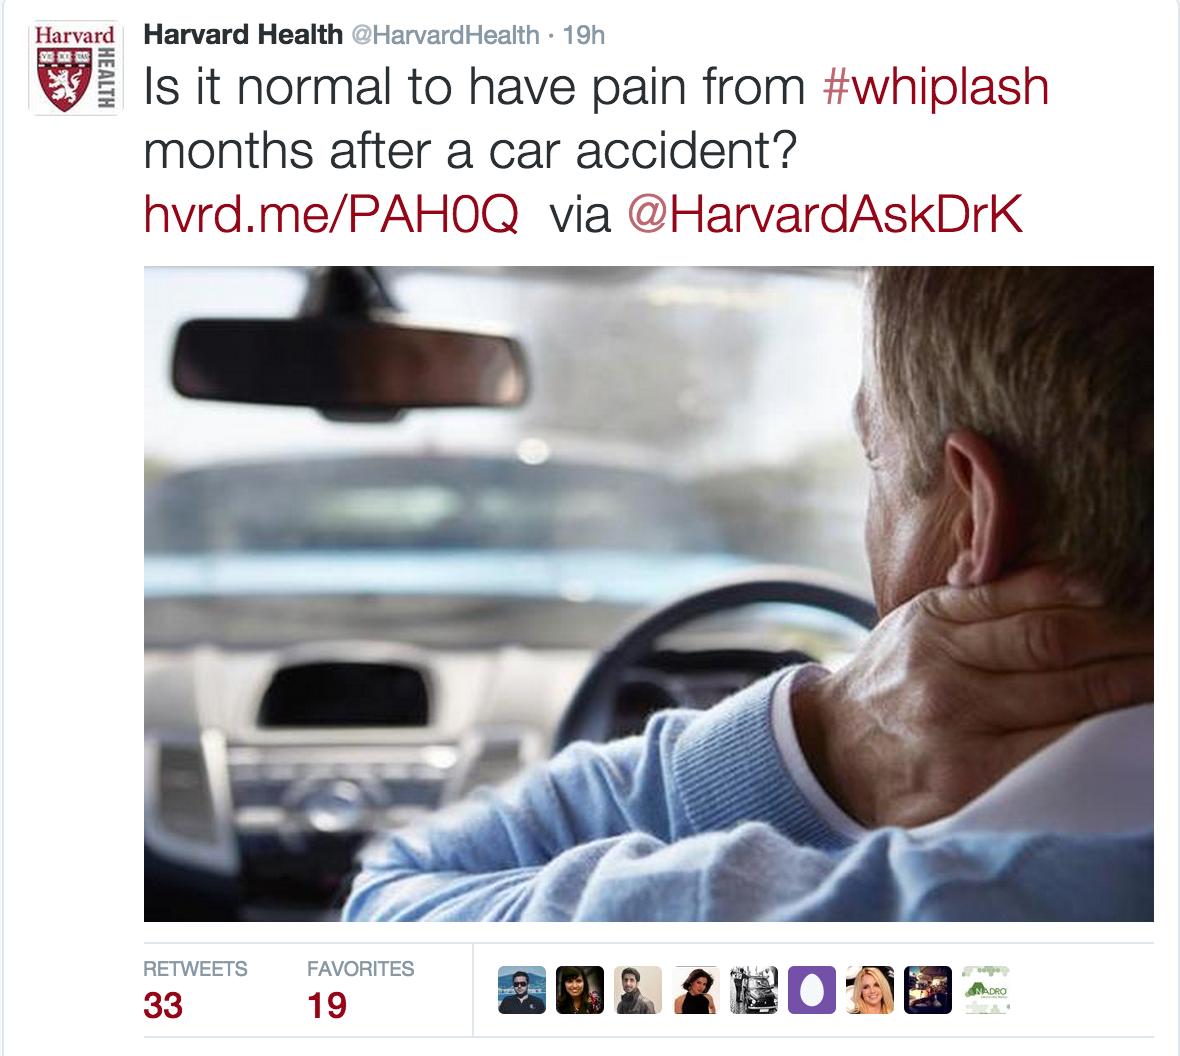 Harvard Auto Accident